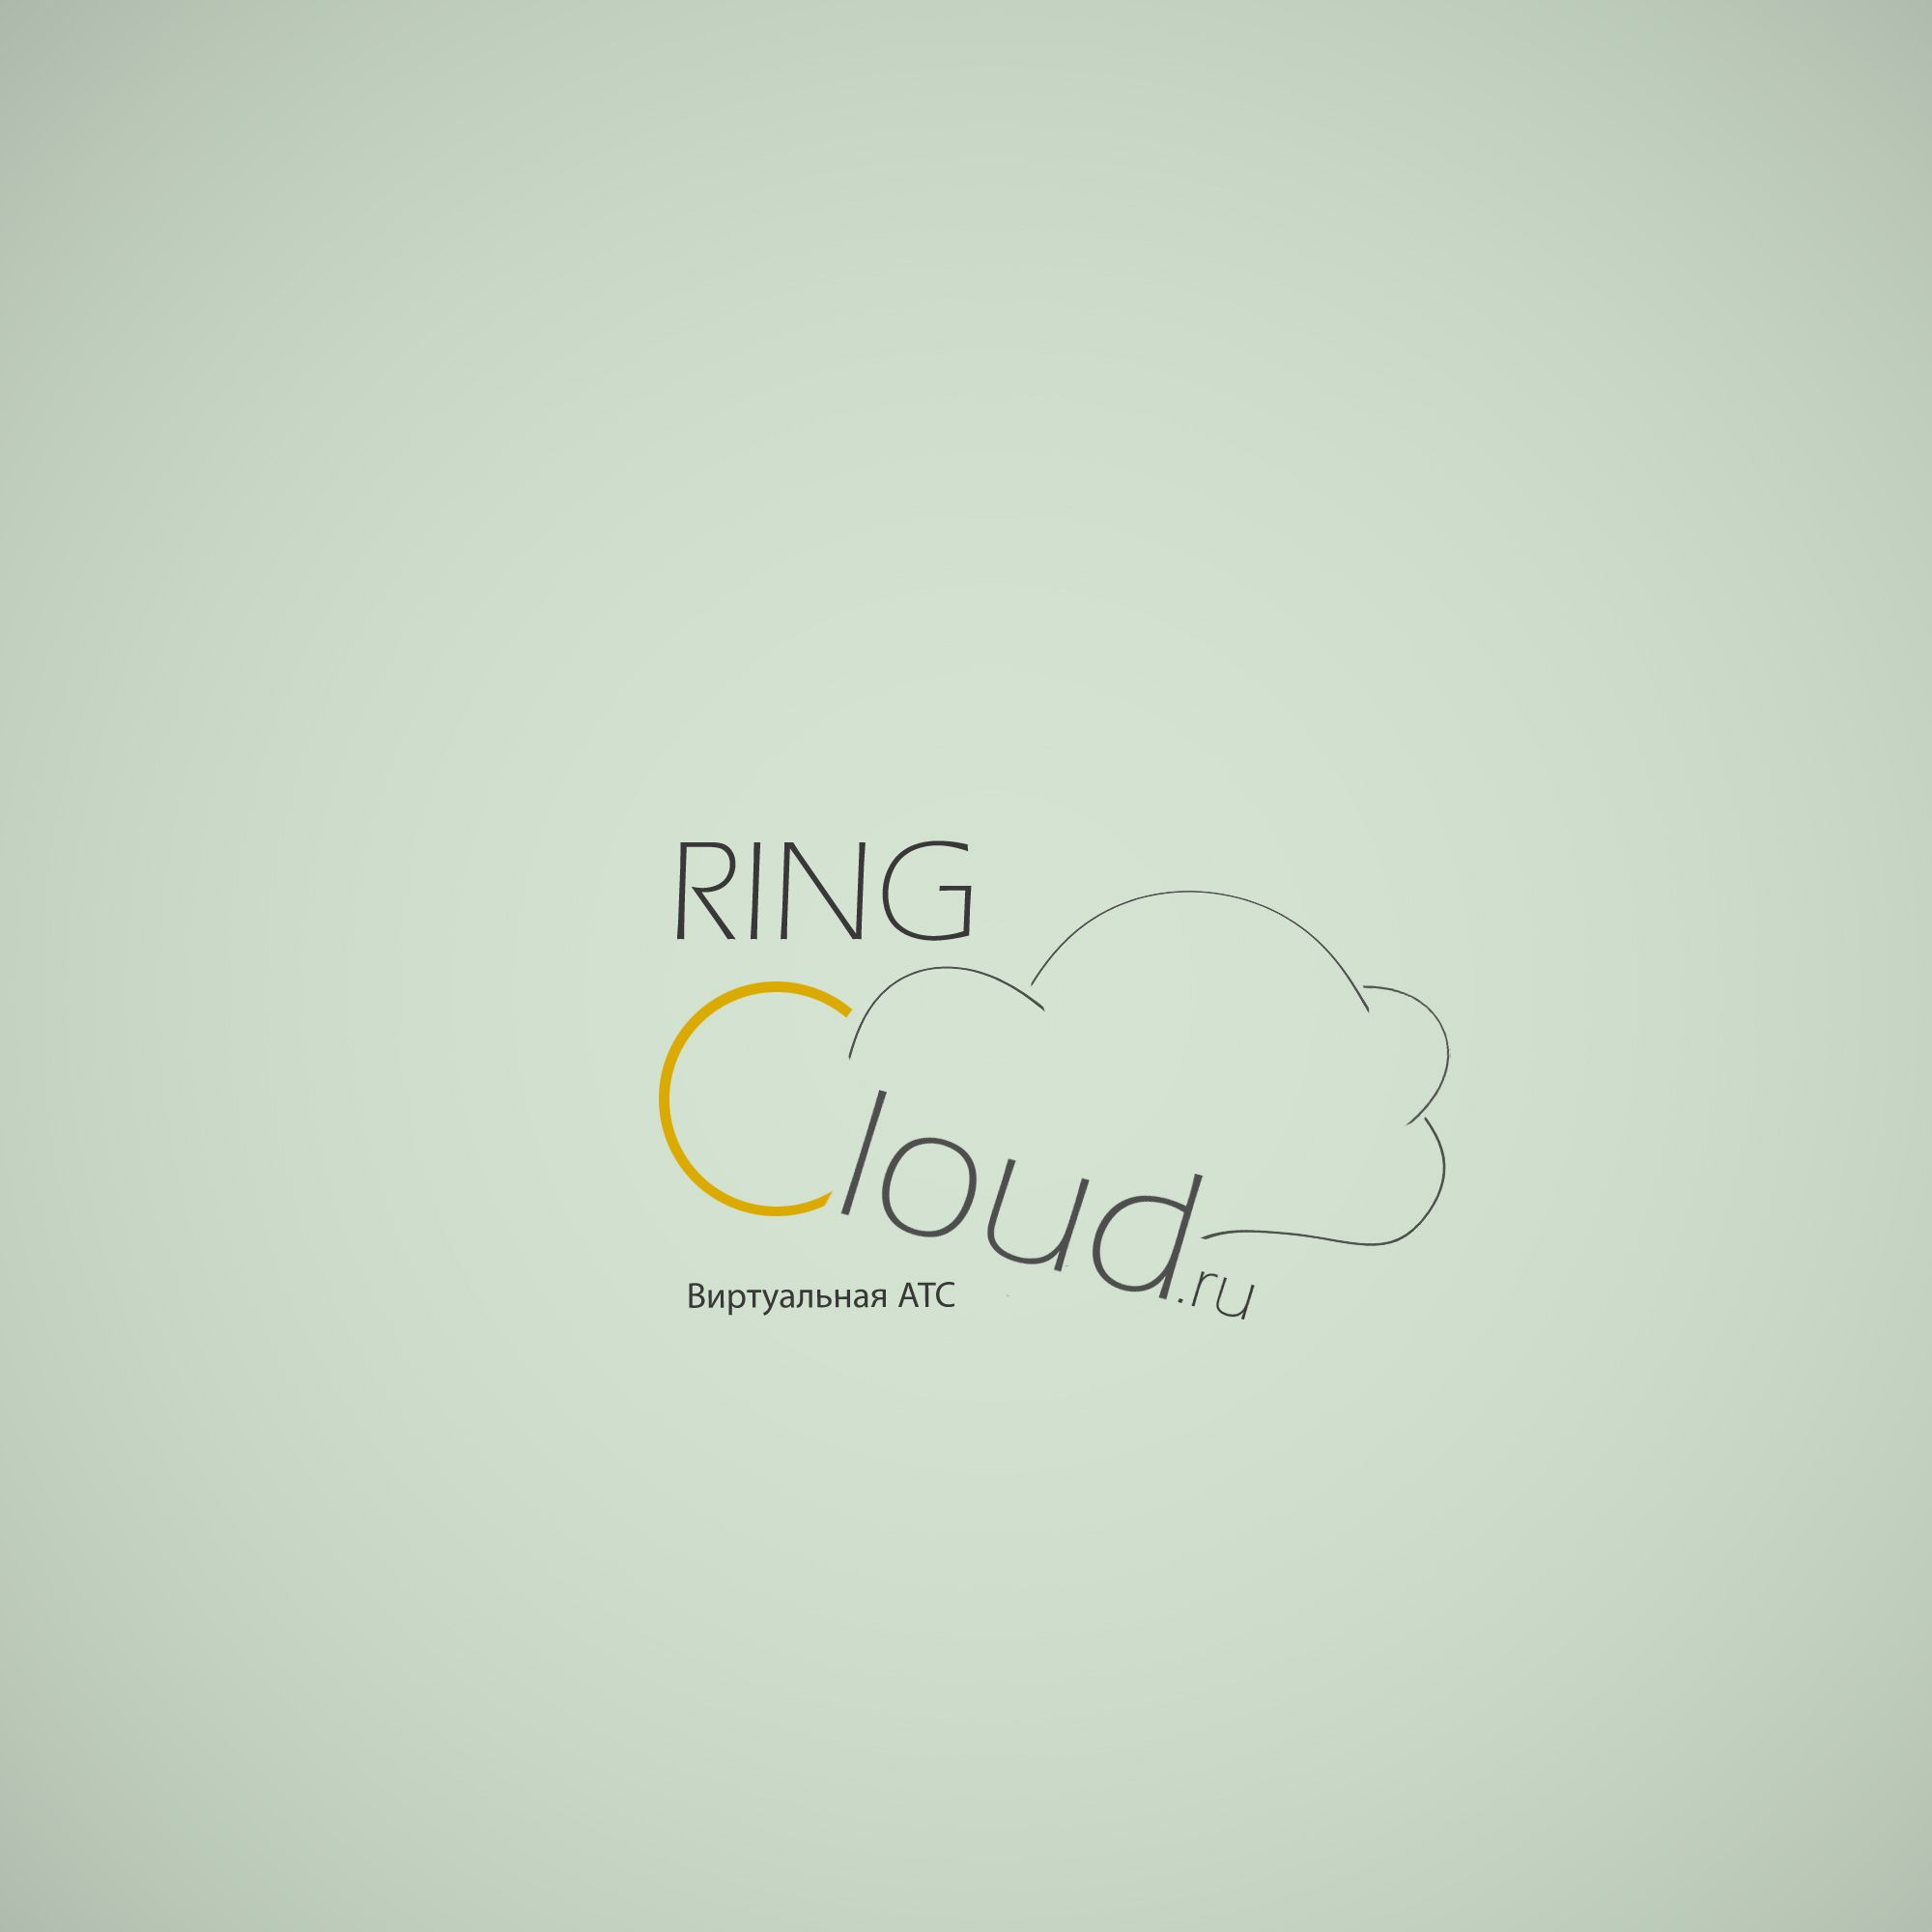 Логотип RingCloud.ru - дизайнер oleggutafamily